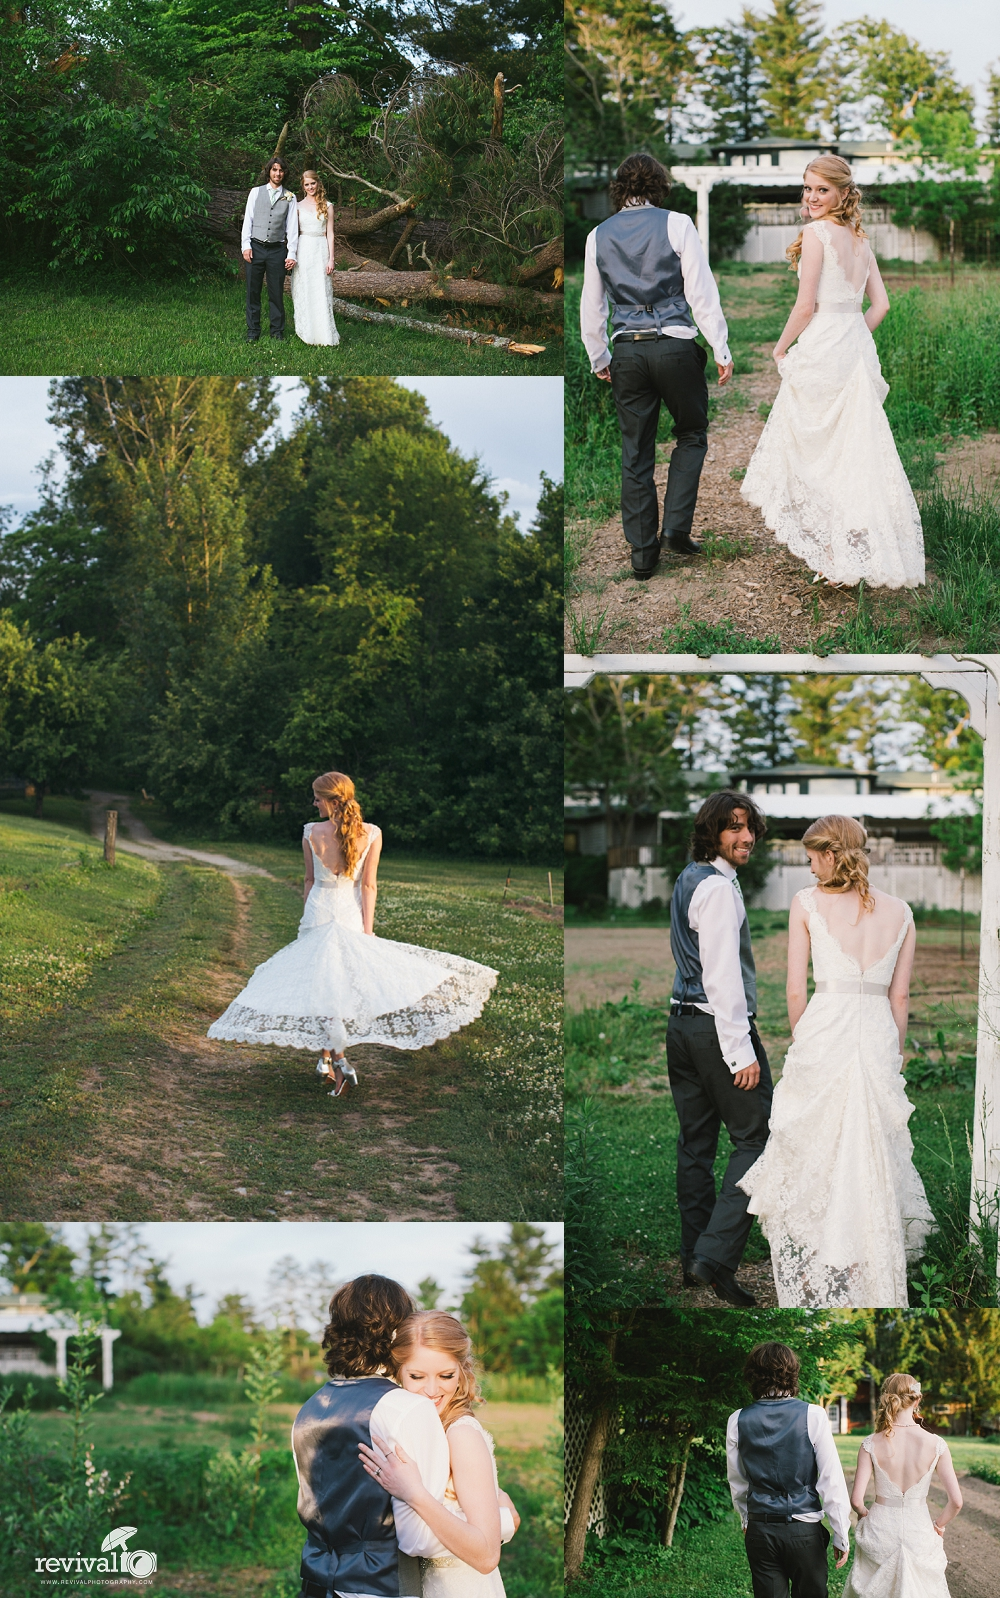 Fine Art Wedding Photography Earthy Elegance Wedding Photos by Revival Photography Wedding at the Highland Lake Inn in Flat Rock NC Wedding Photos by www.revivalphotography.com